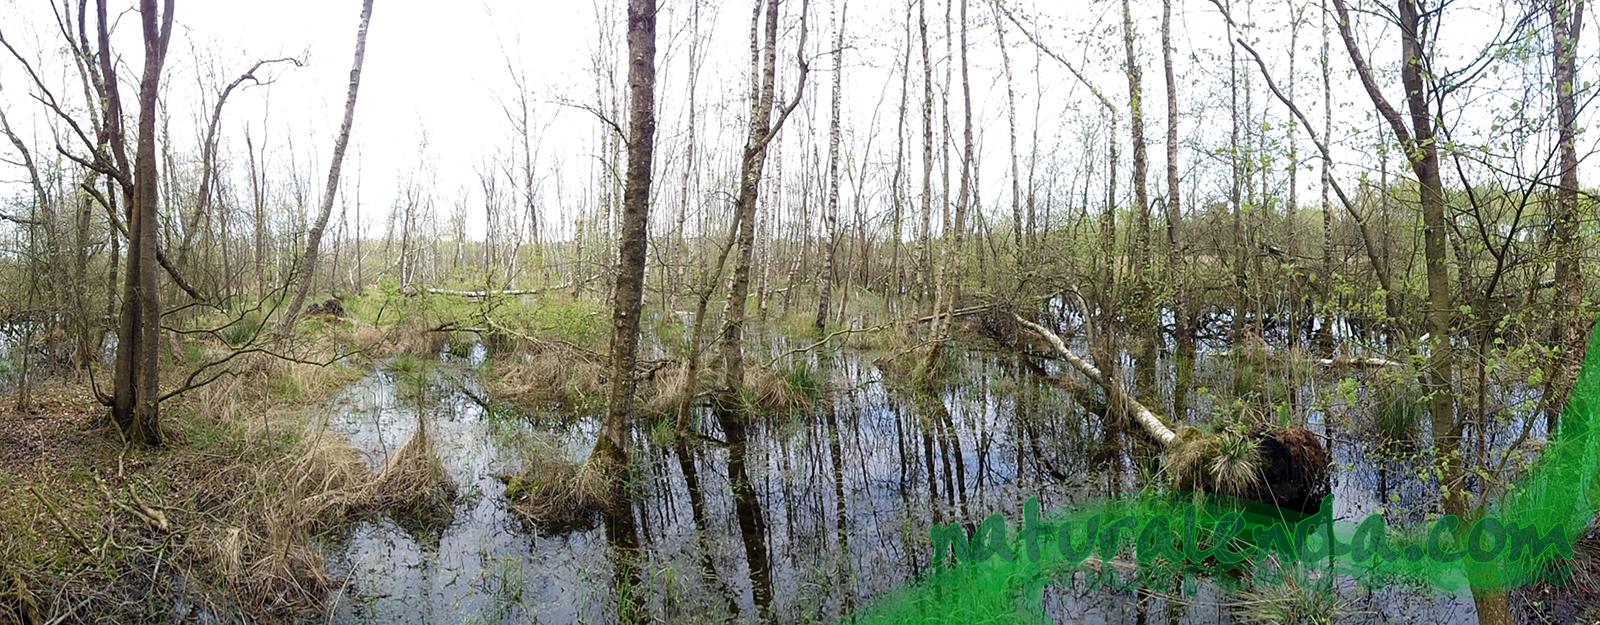 panoramica 2 del pantano con arboles